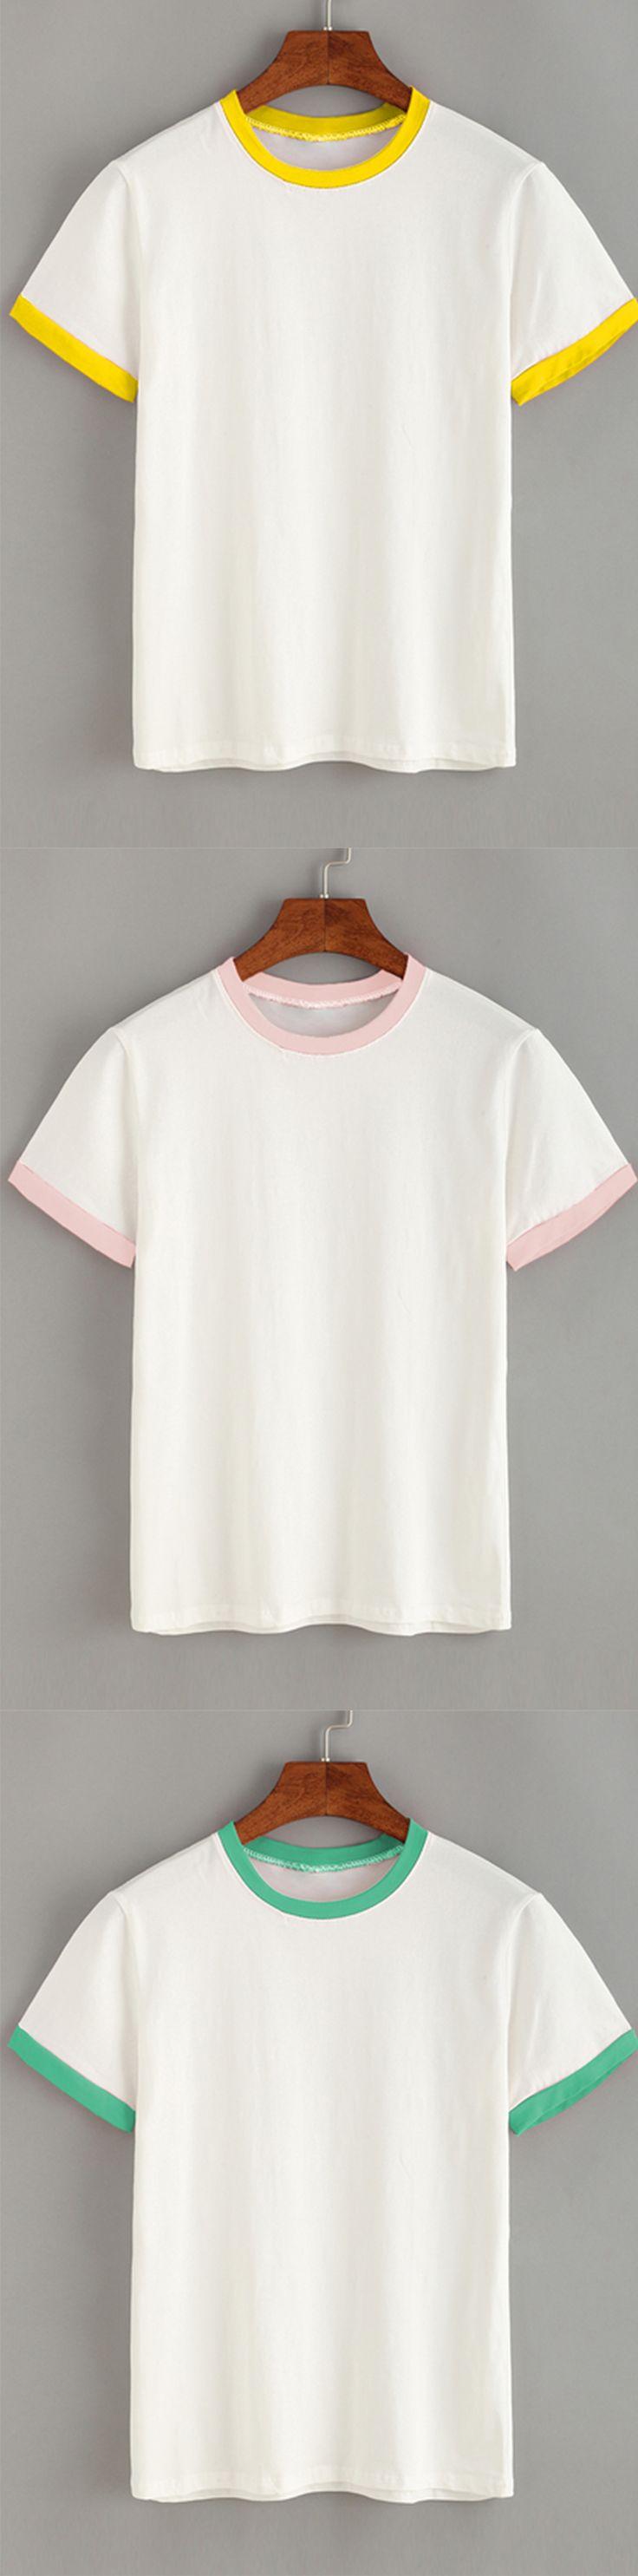 Casual Style - Contrast Trim Plain T-shirt - Pink